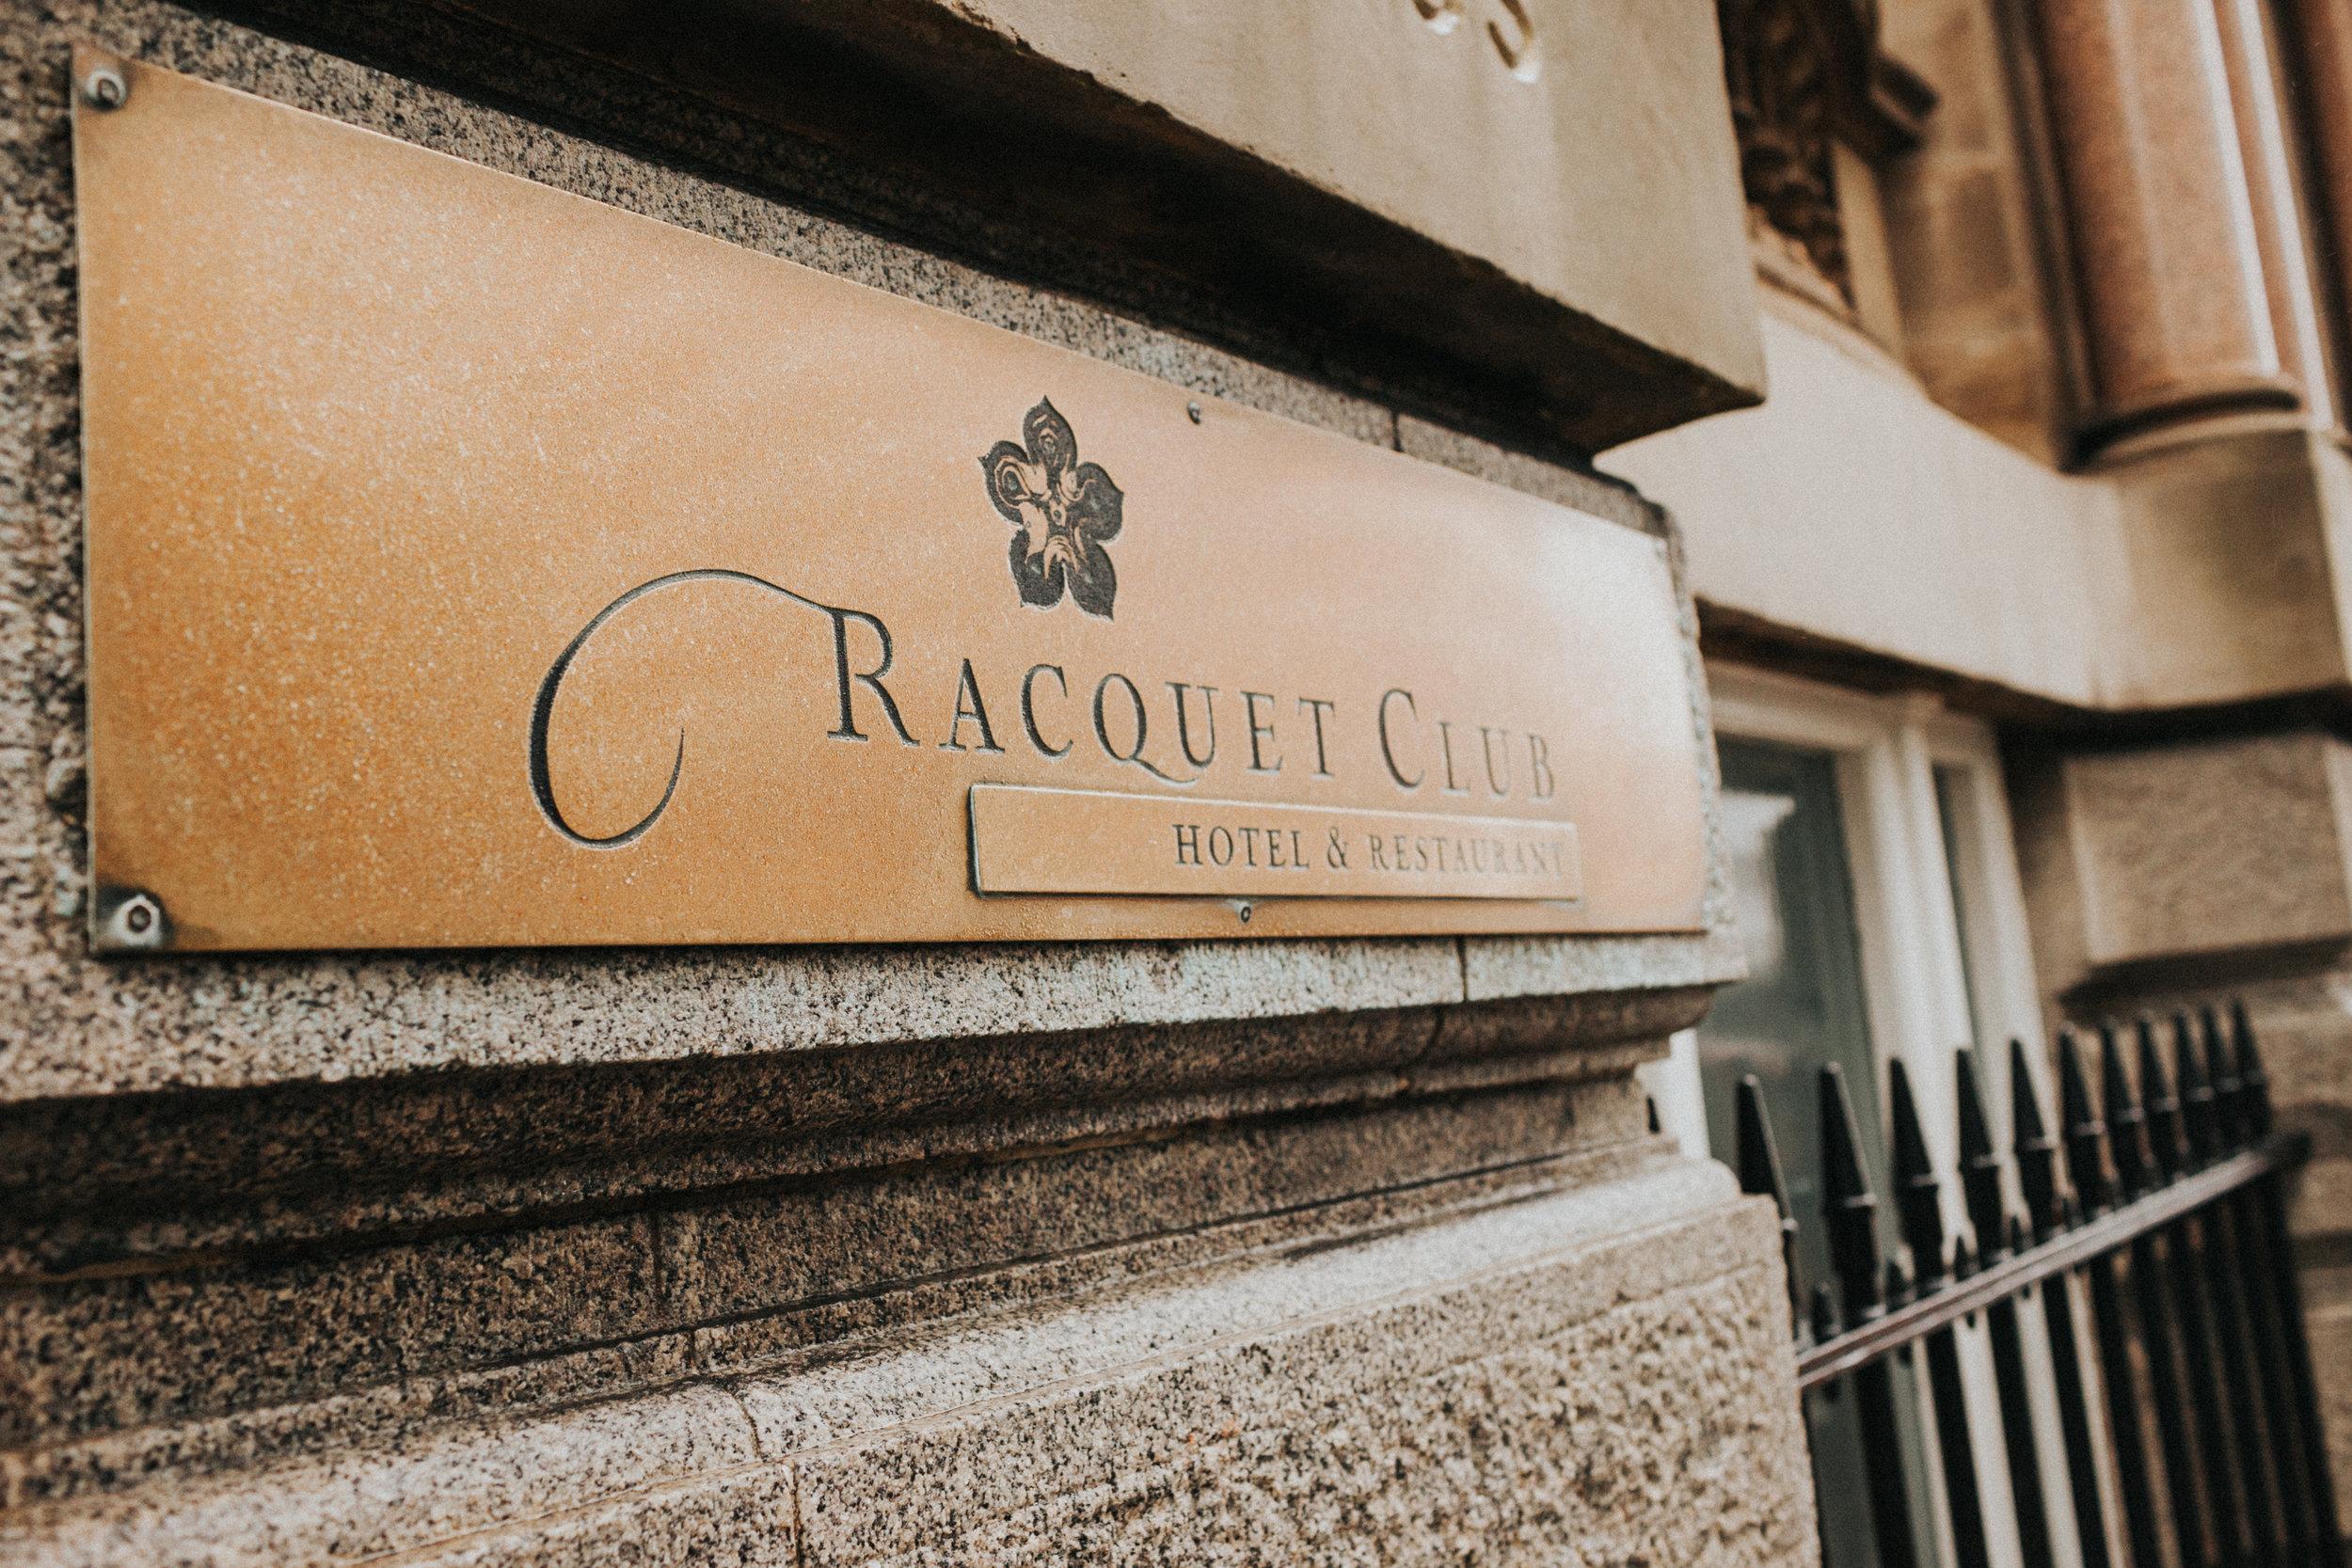 Racquet Club sign